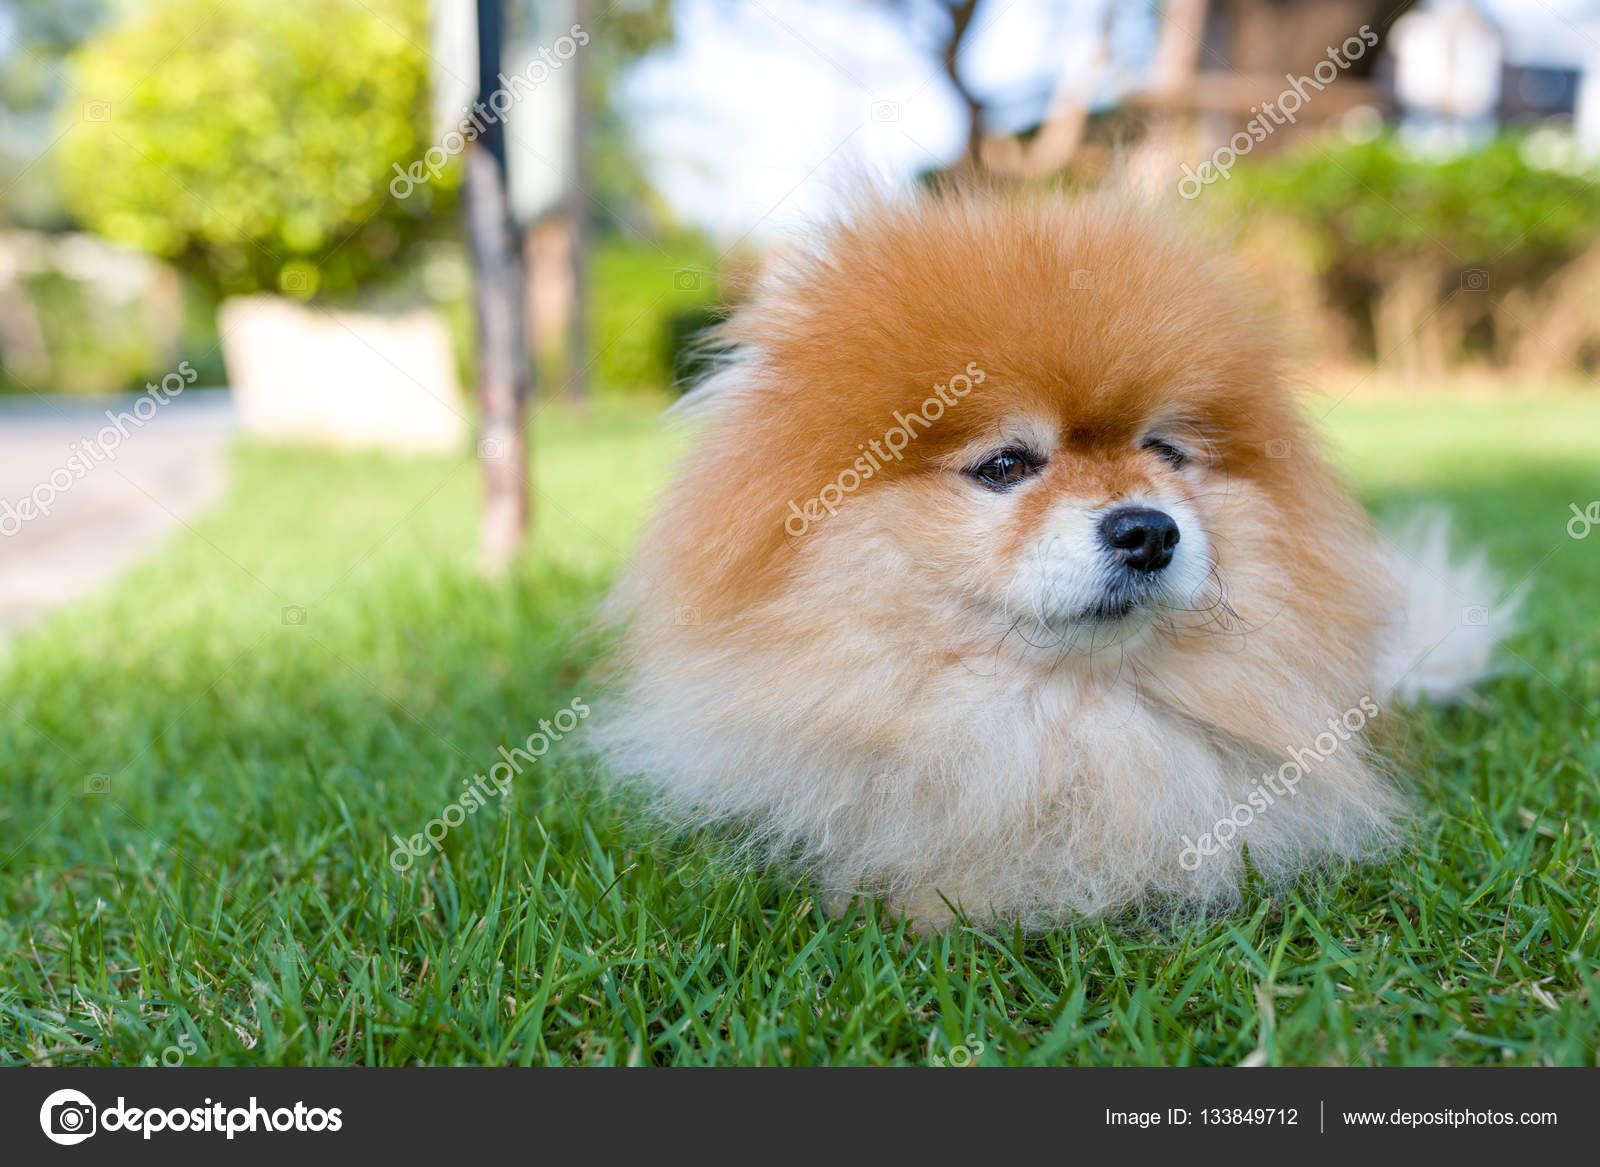 Pomeranian Dog Sitting In Lawn Stock Photo C Supparsorn 133849712